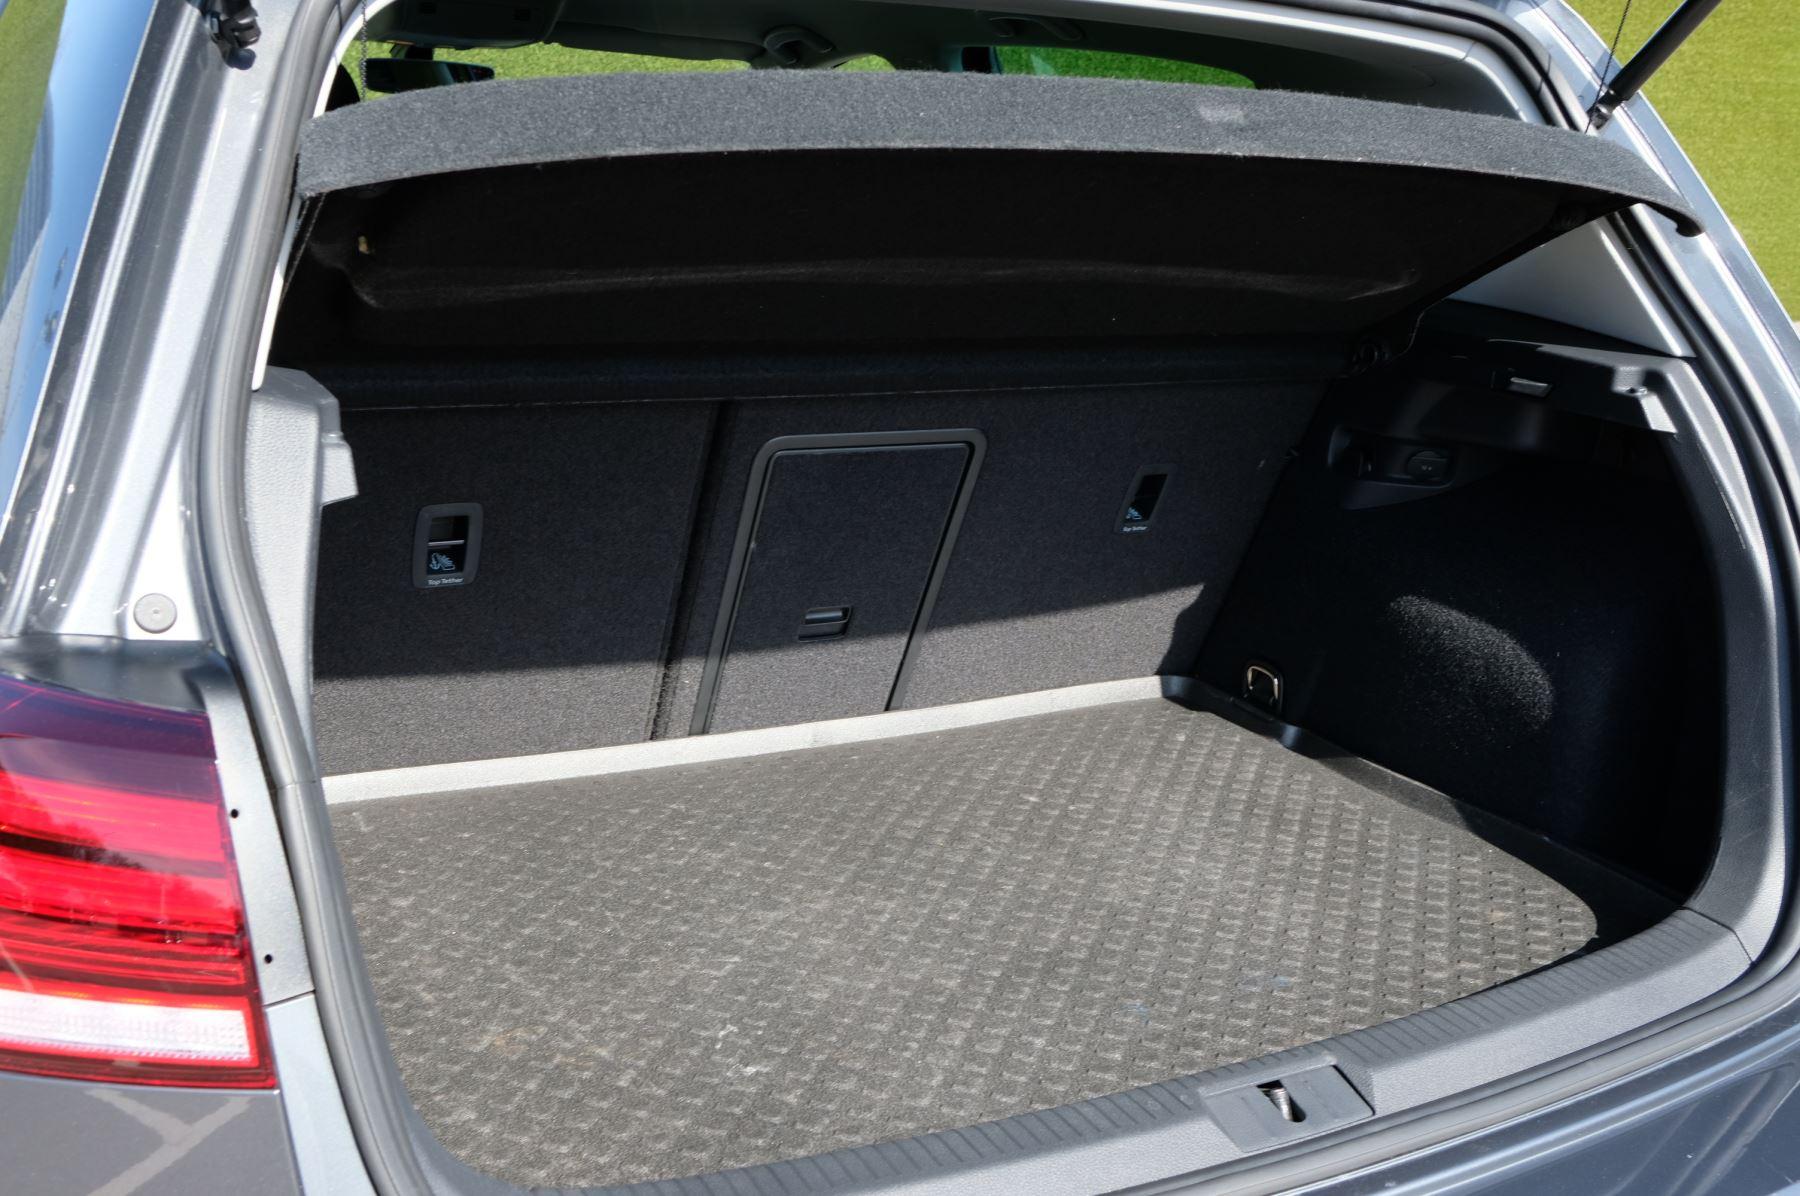 Volkswagen Golf 1.5 TSI EVO 150hp Match 5 Door DSG Auto with A/Con, Sat Nav, Alloys & Adaptive Cruise  image 12